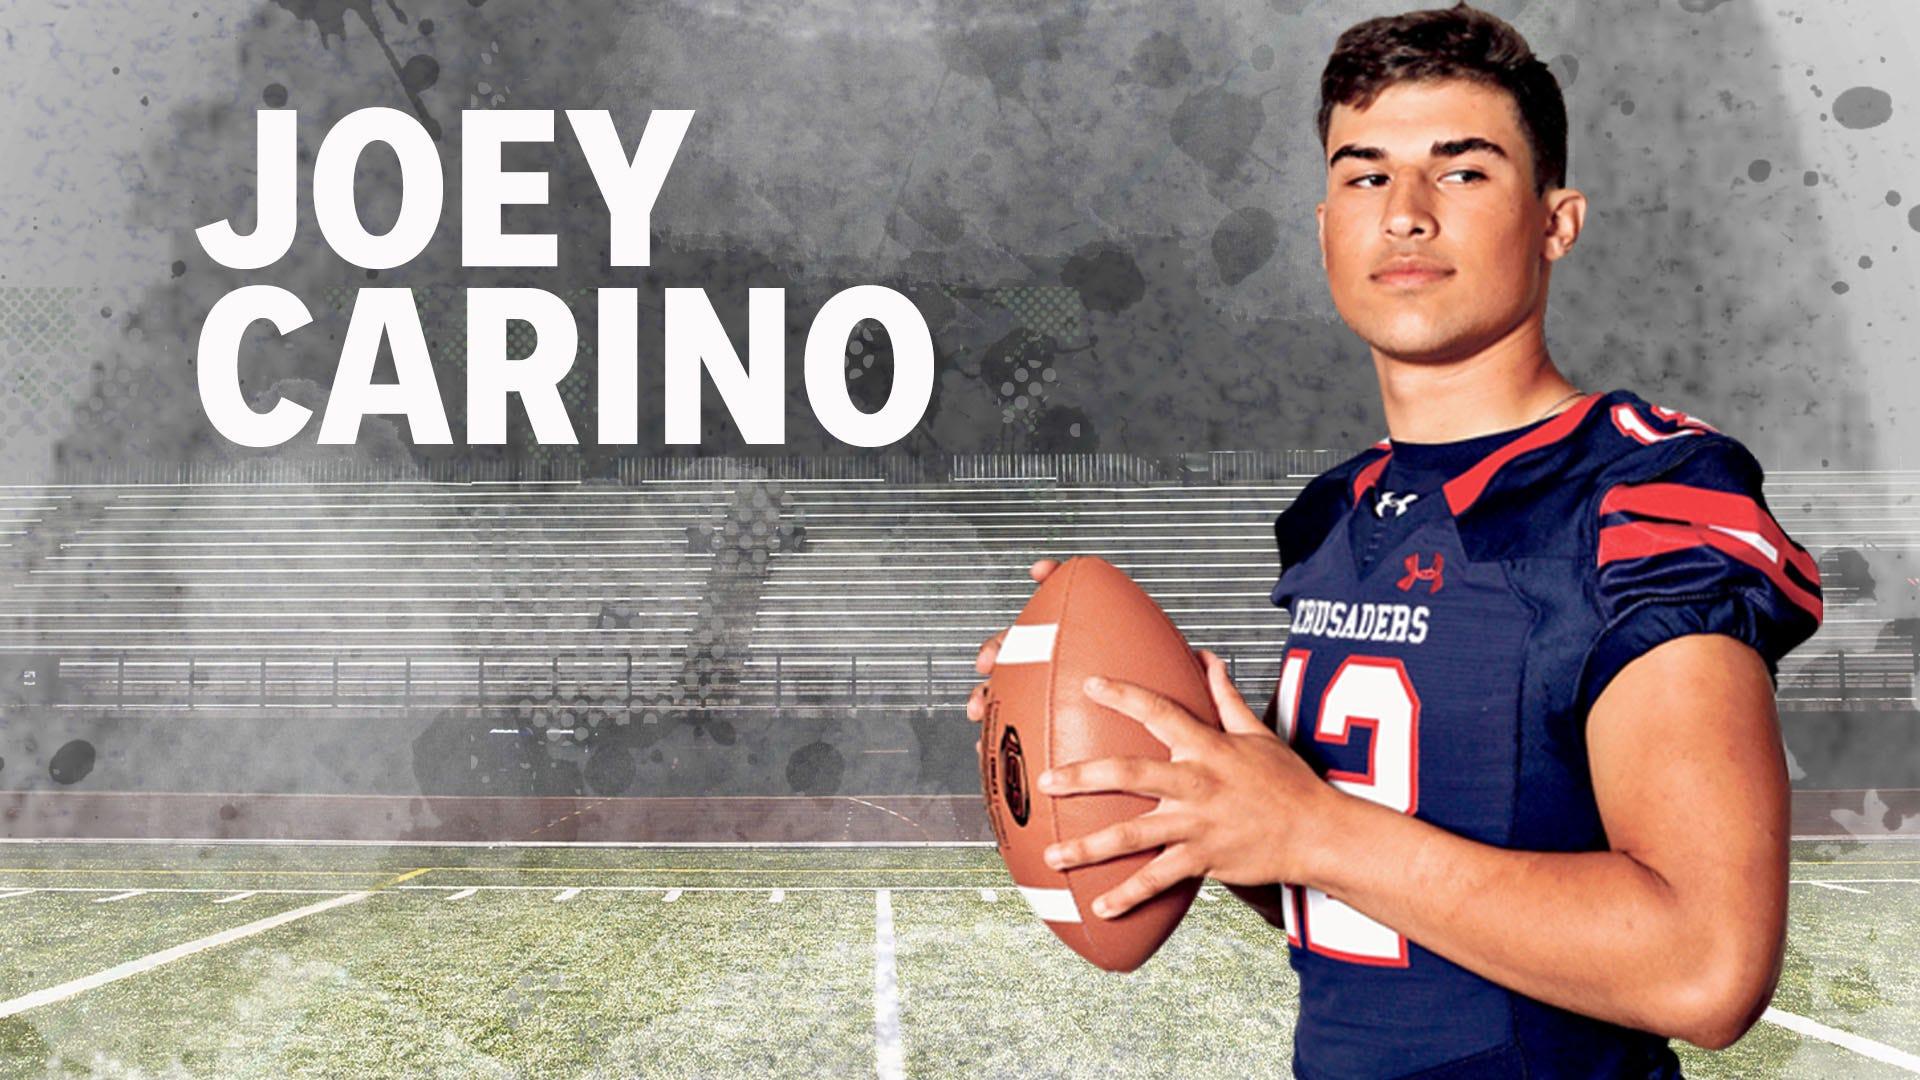 Joey Carino